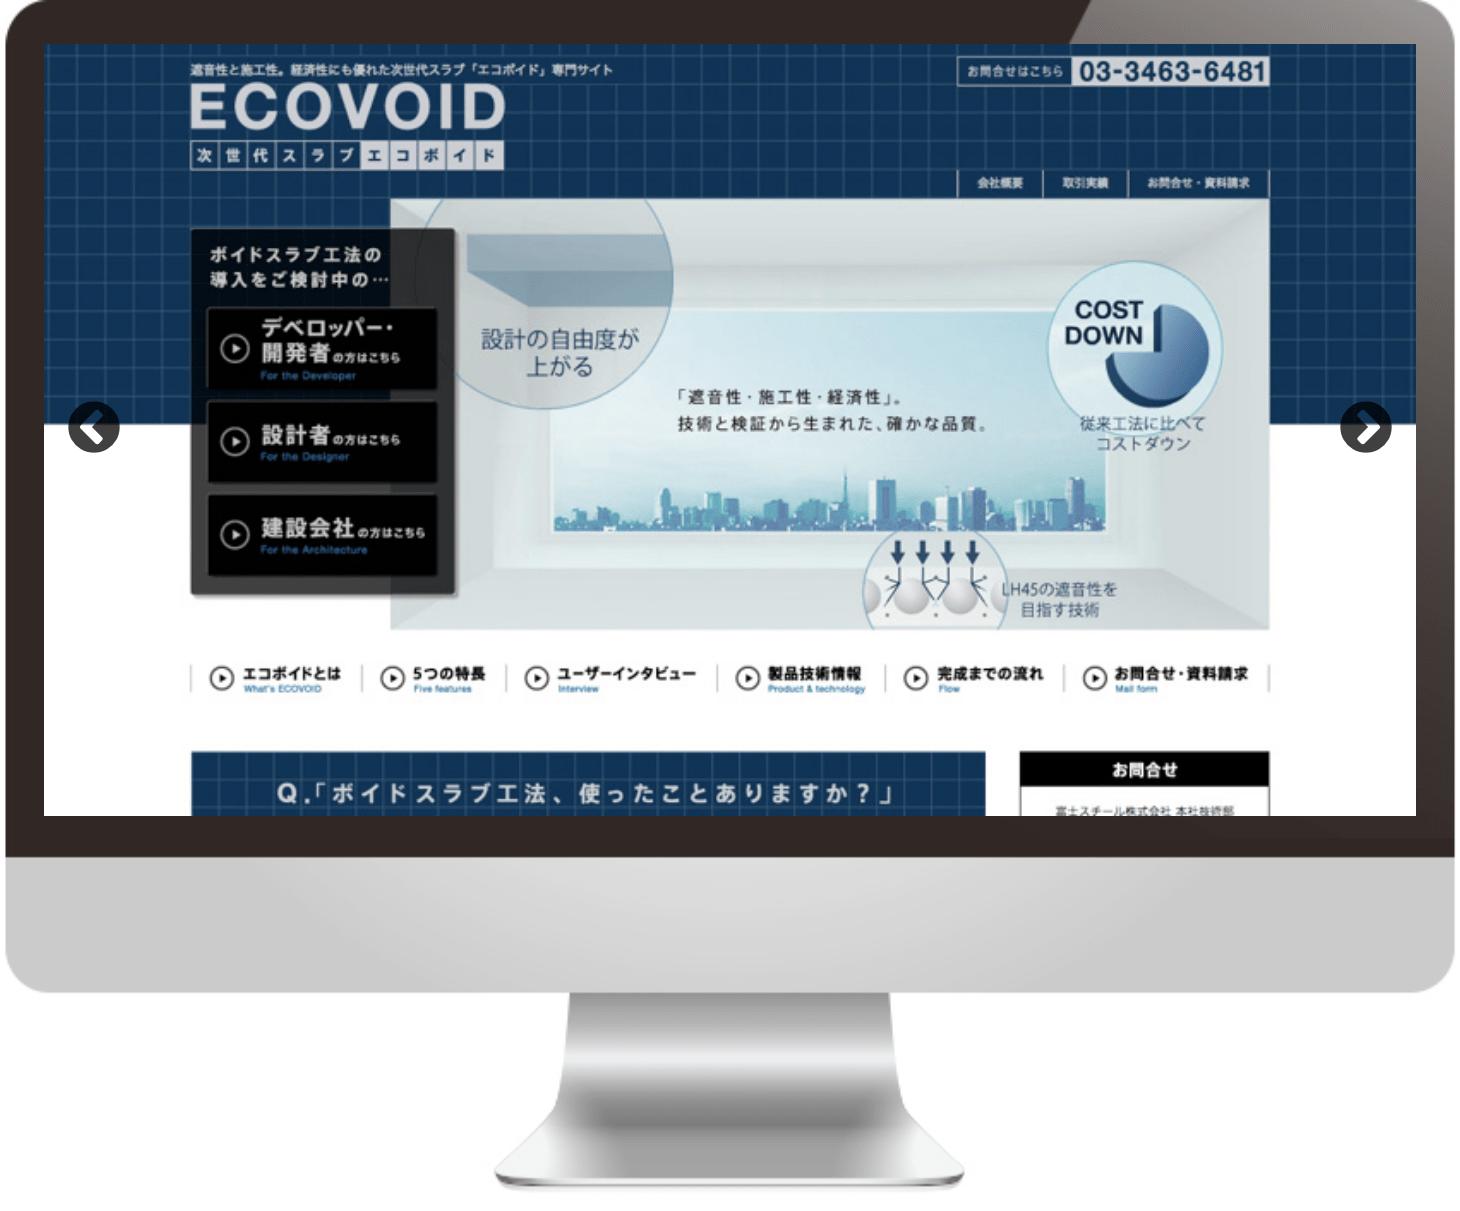 BtoB商用サイトのTOPページ